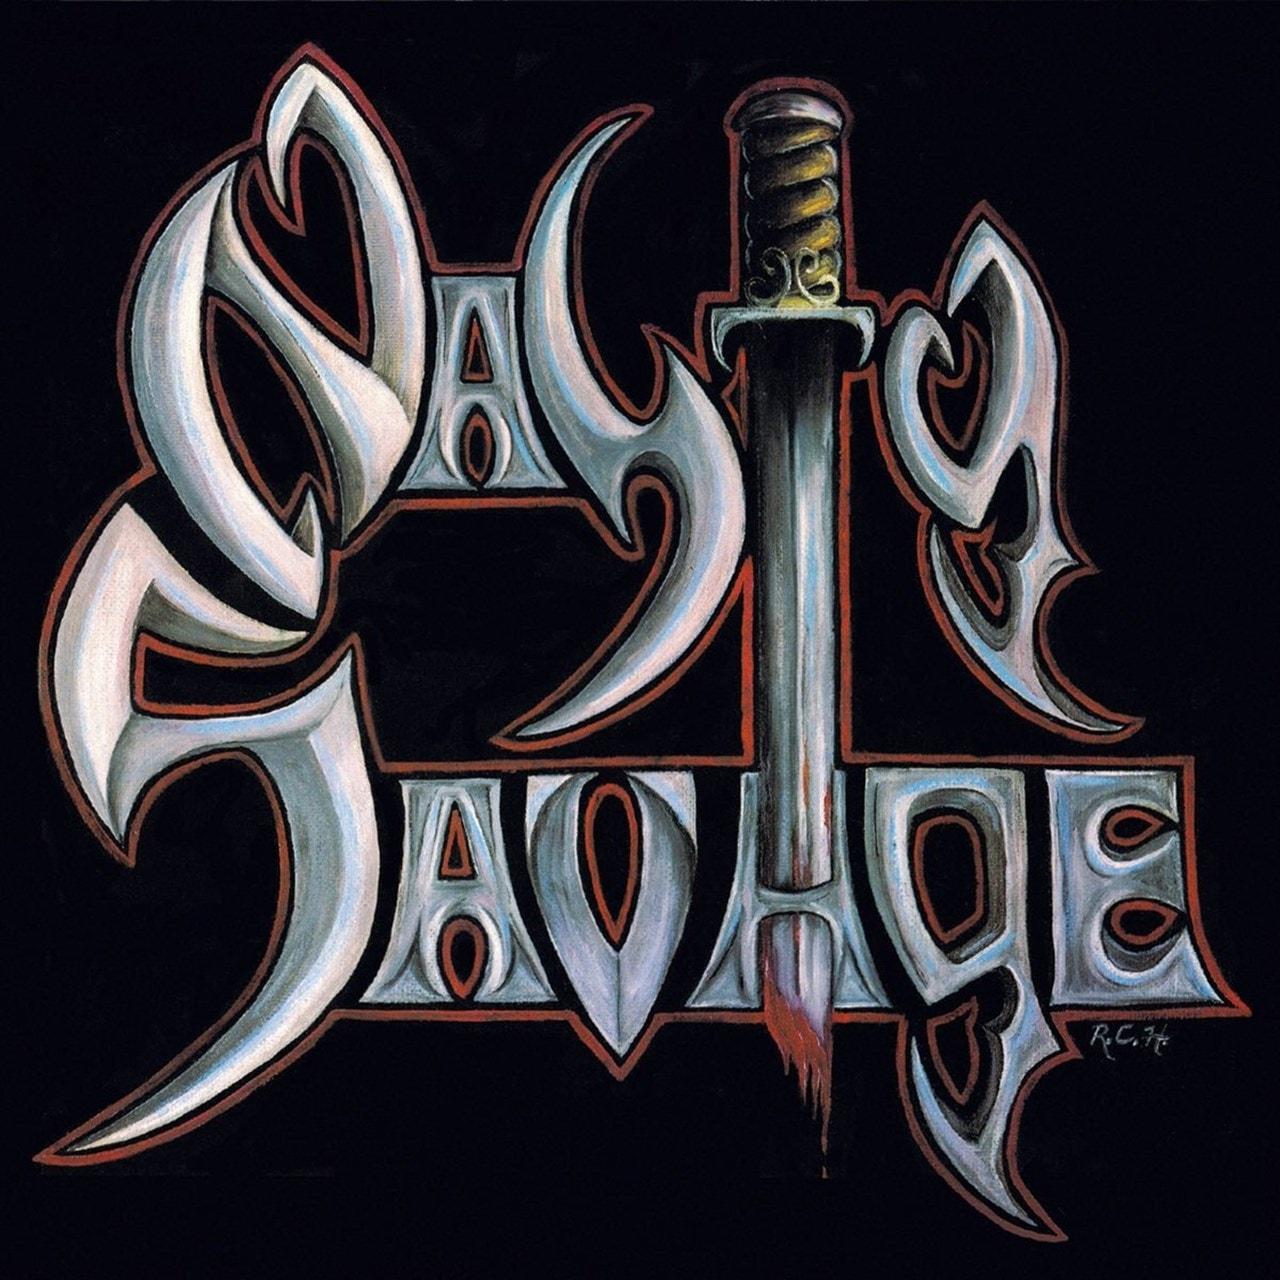 Nasty Savage - 1